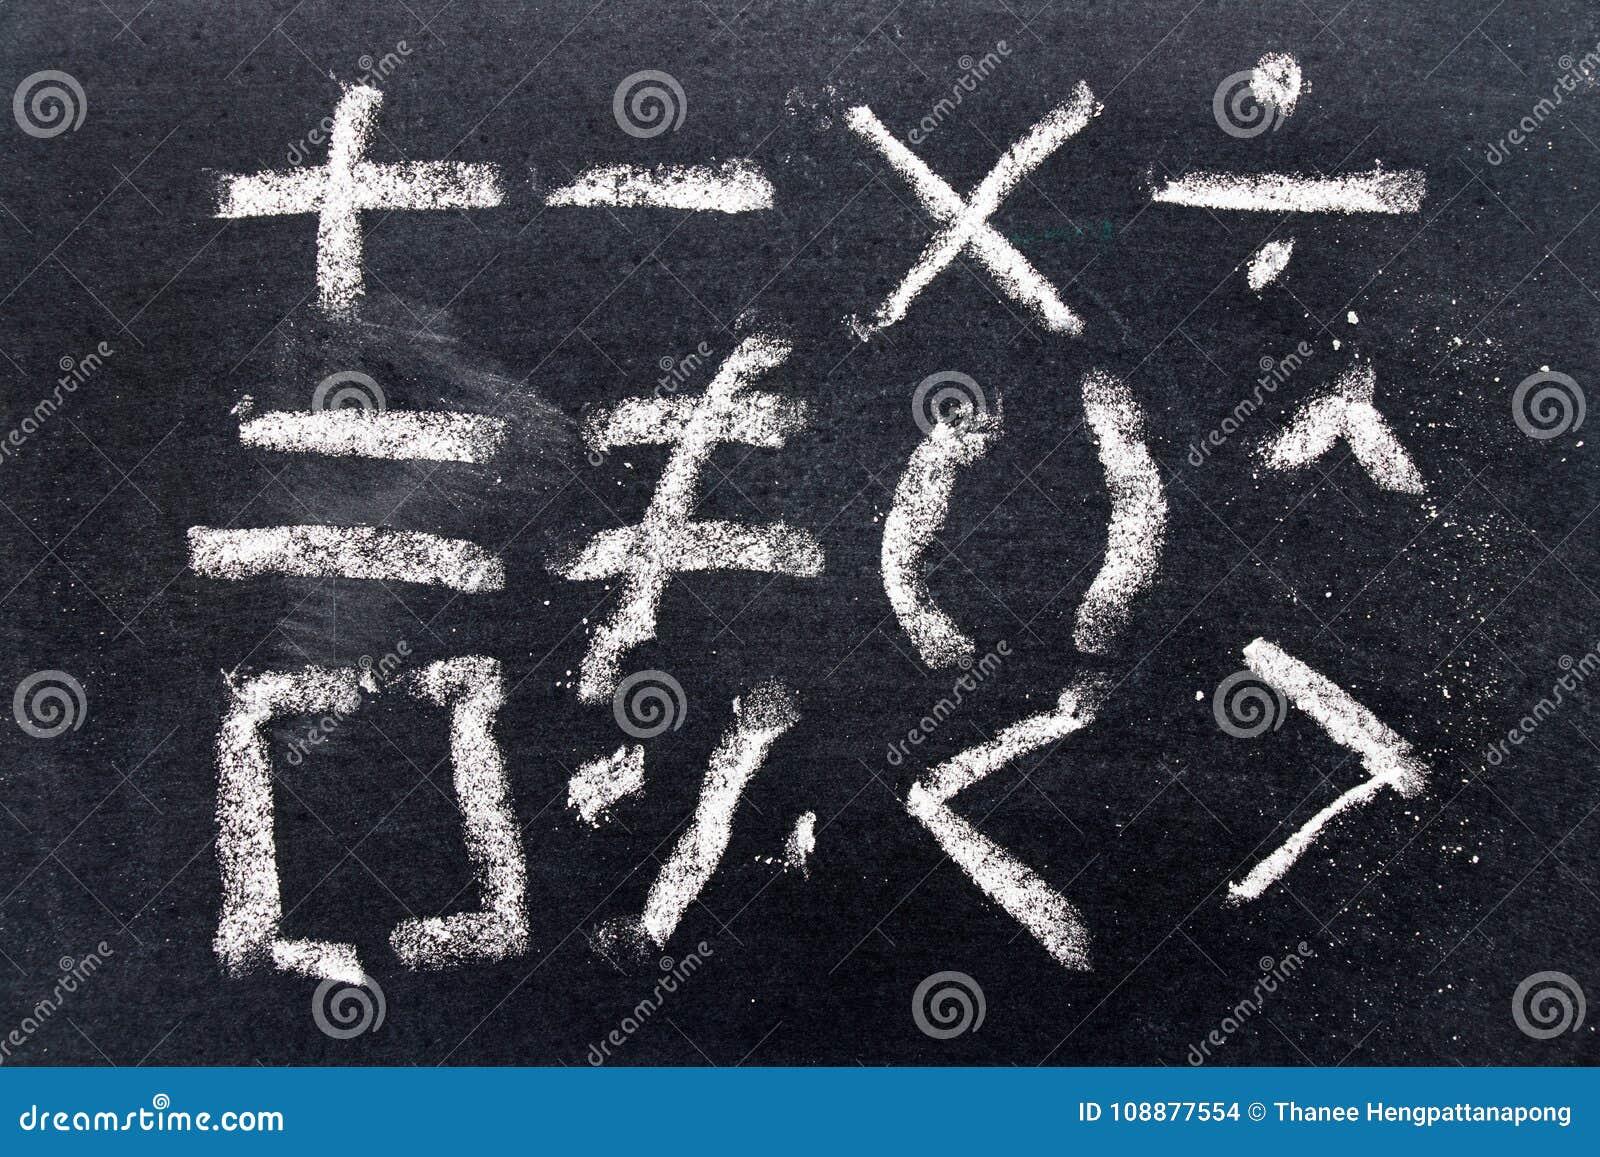 Set of math symbol draw by chalk on black board